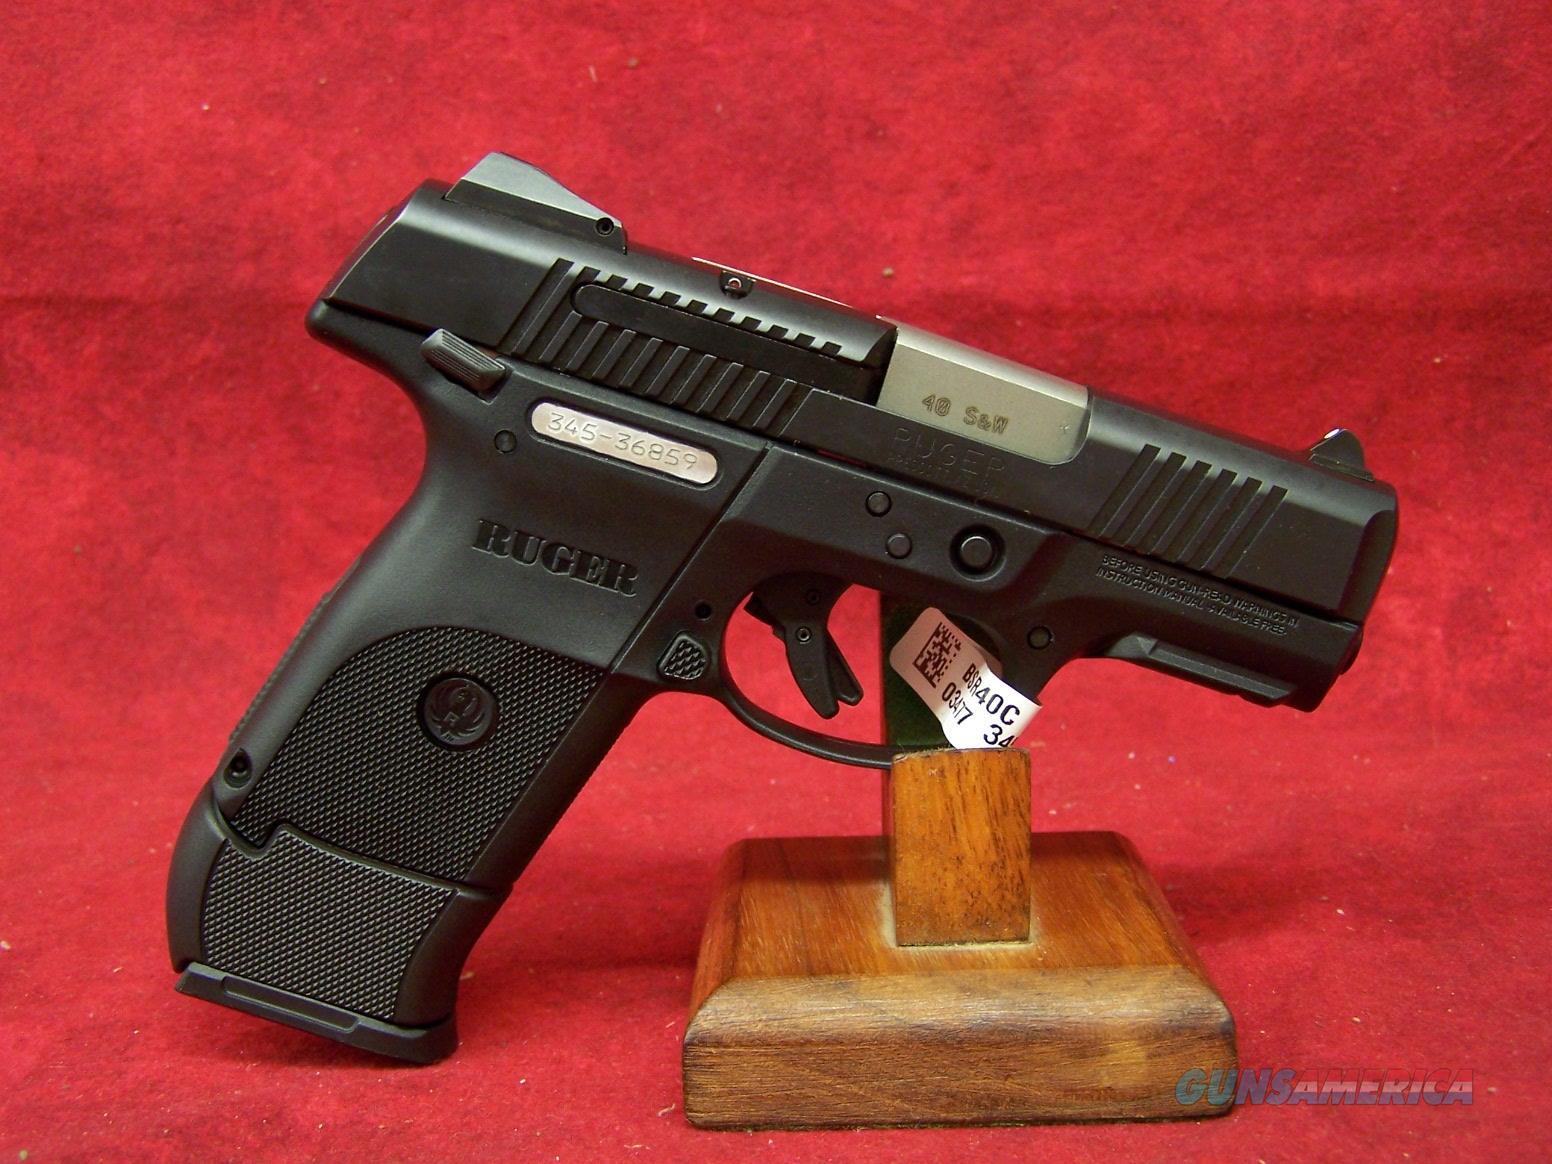 Ruger SR40C Compact .40 Smith & Wesson 3.5 Inch Barrel (03477)  Guns > Pistols > Ruger Semi-Auto Pistols > SR Family > SR40C